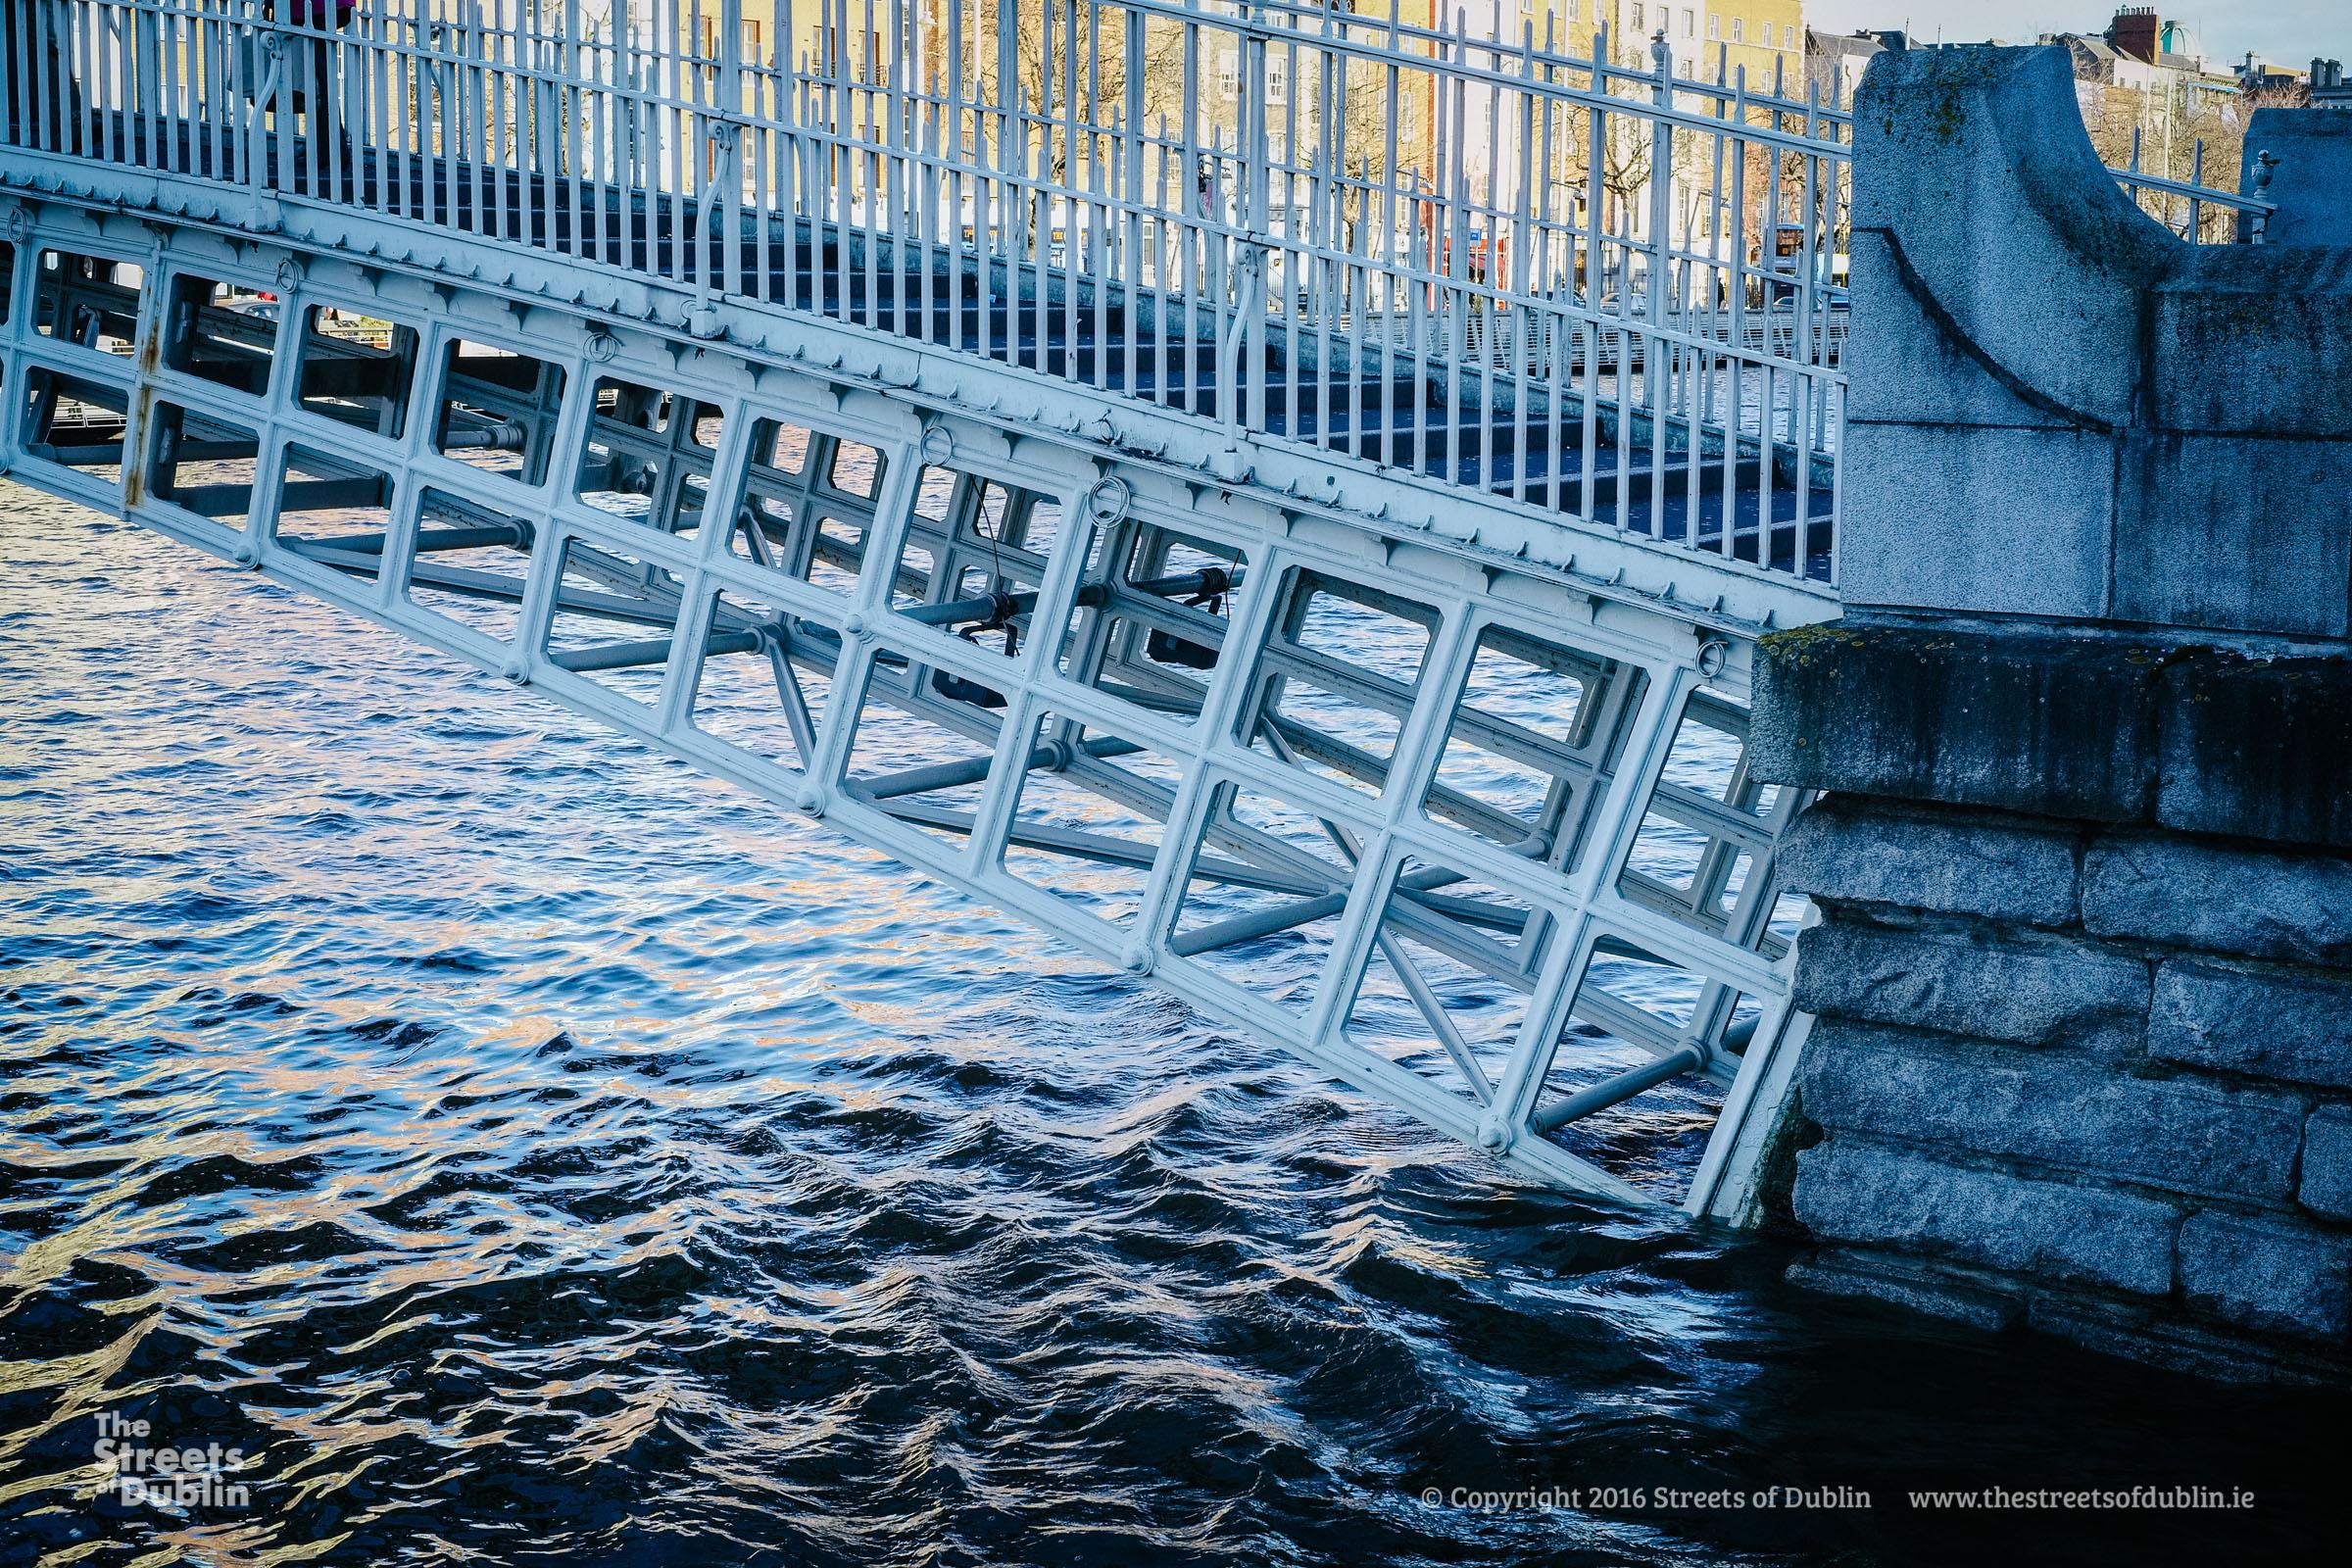 Streets-of-Dublin-Photo-2-158.jpg